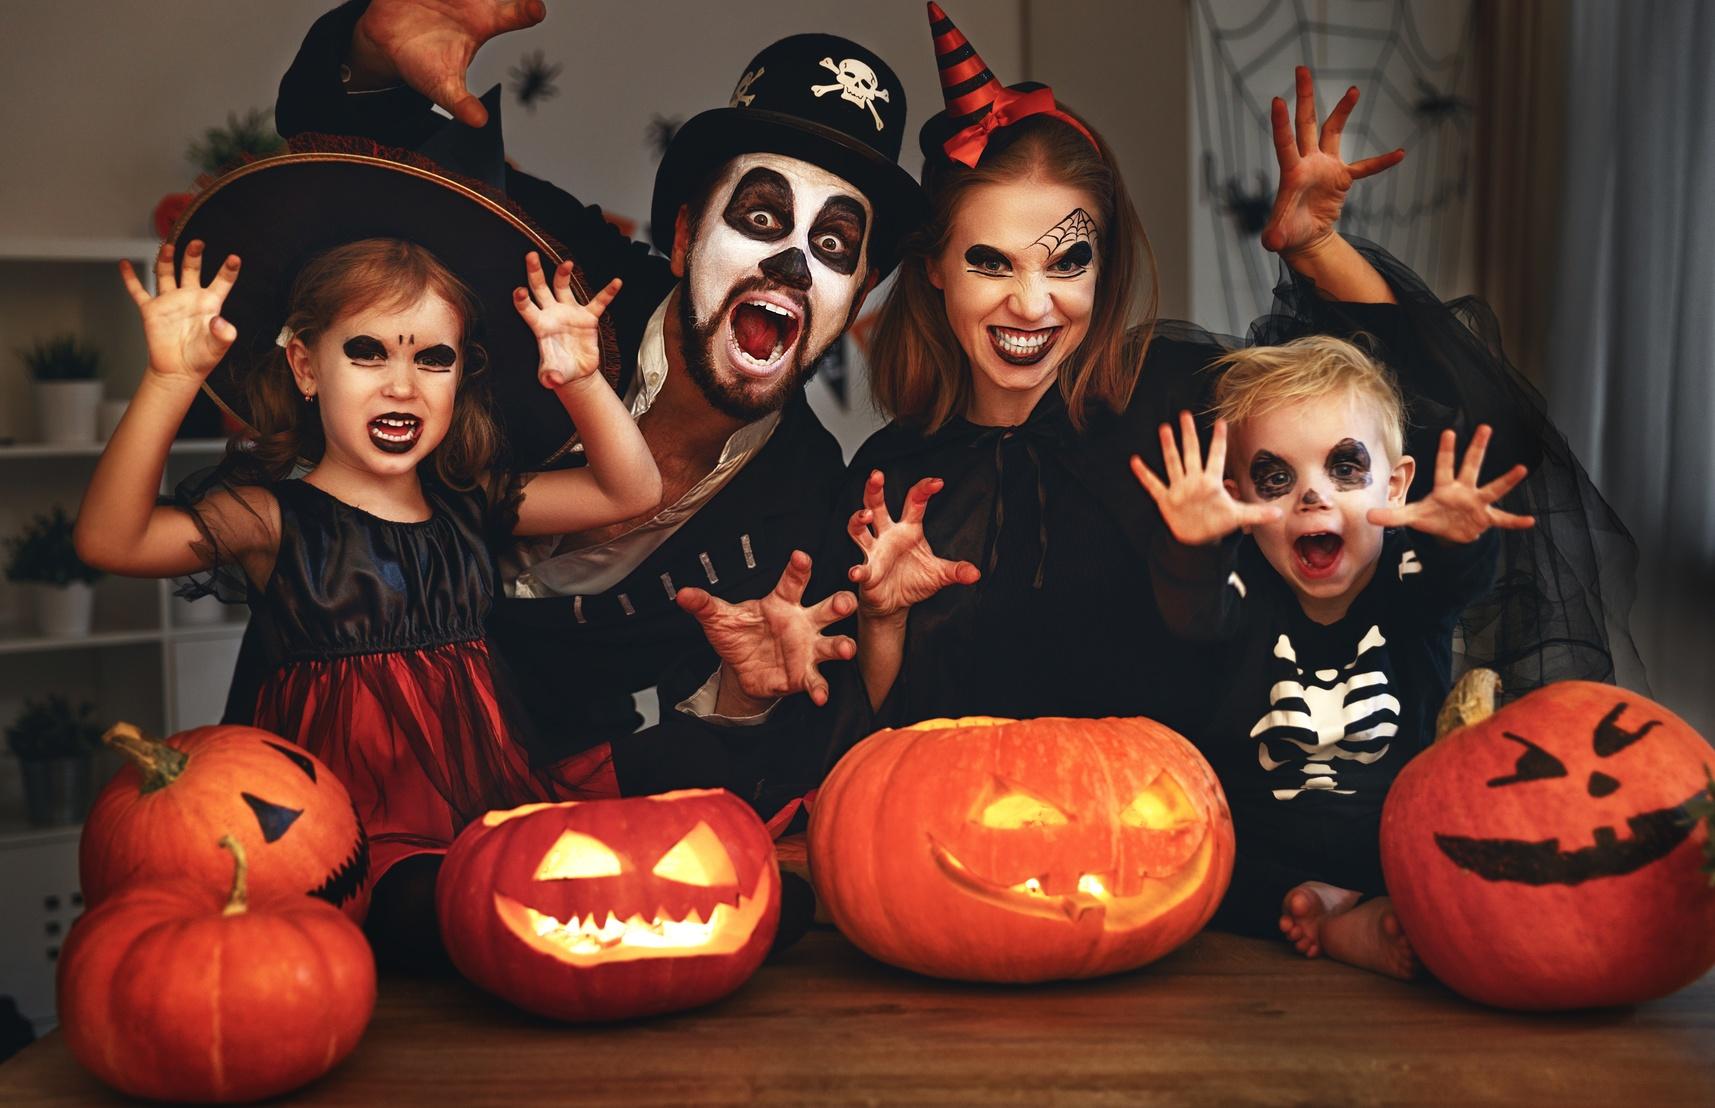 NgàY Halloween 2020 What we need for Halloween?